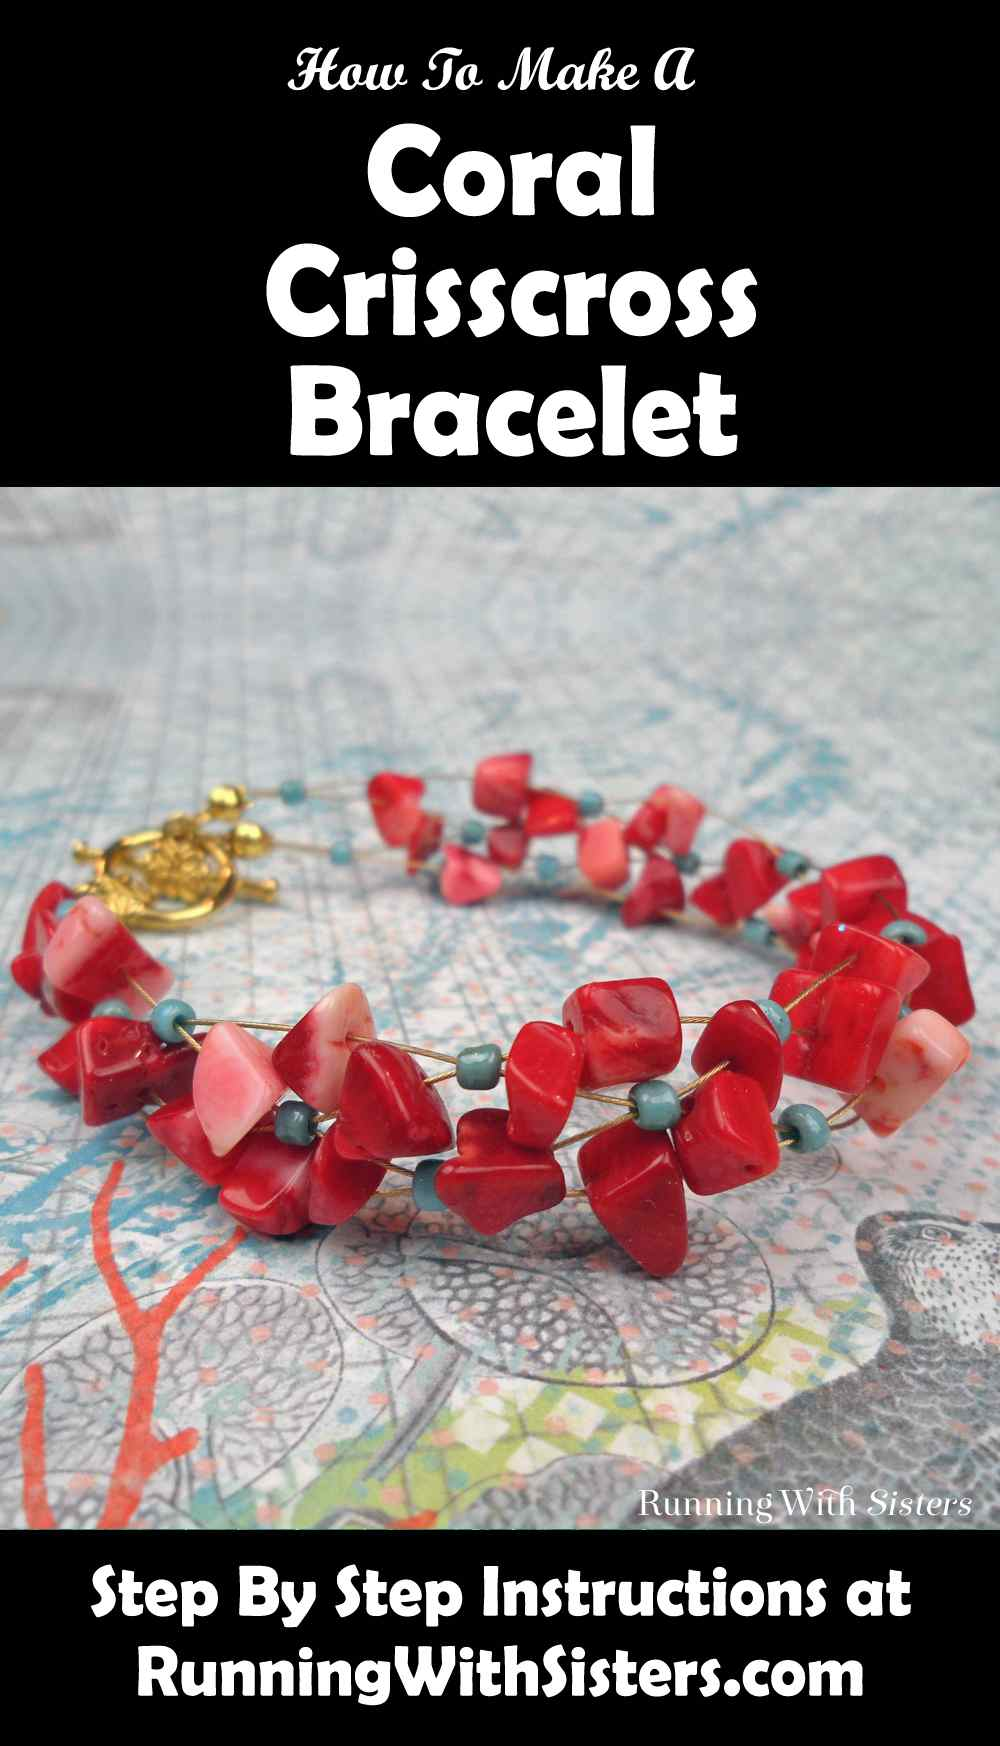 Coral Crisscross Bracelet Pinterest